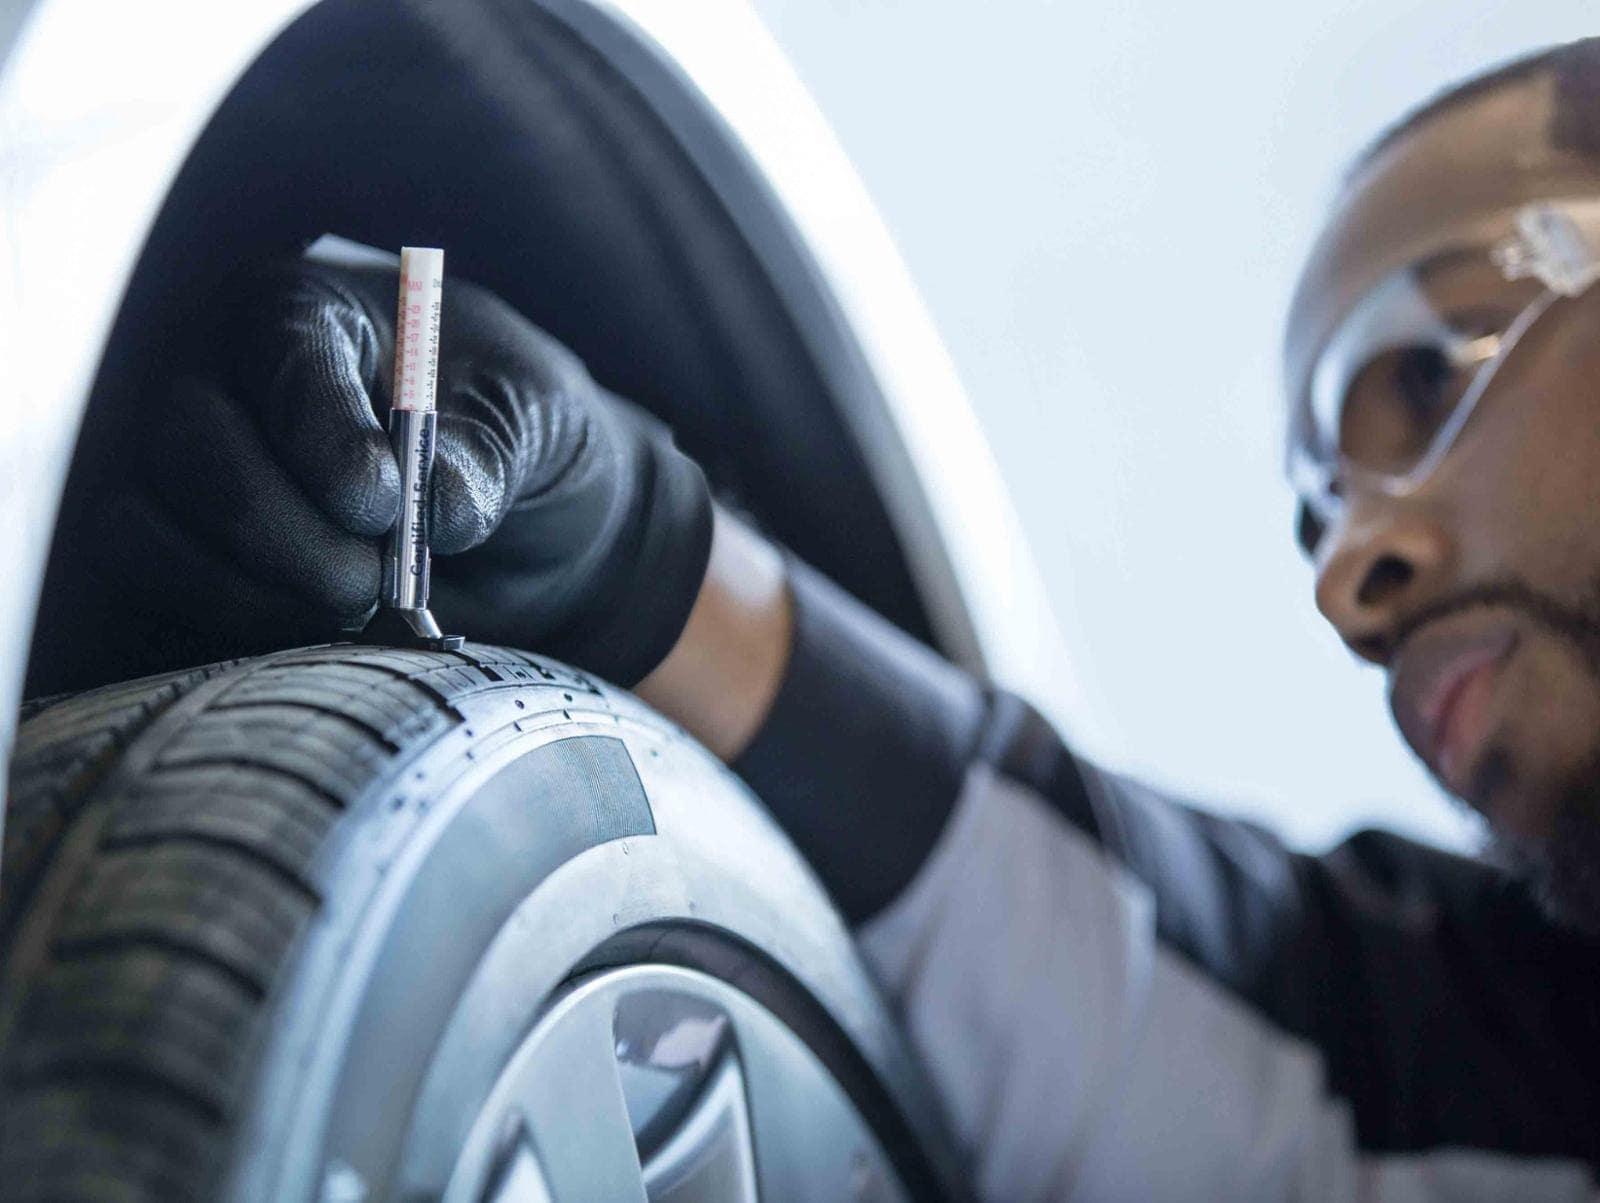 Tire pressure inspection